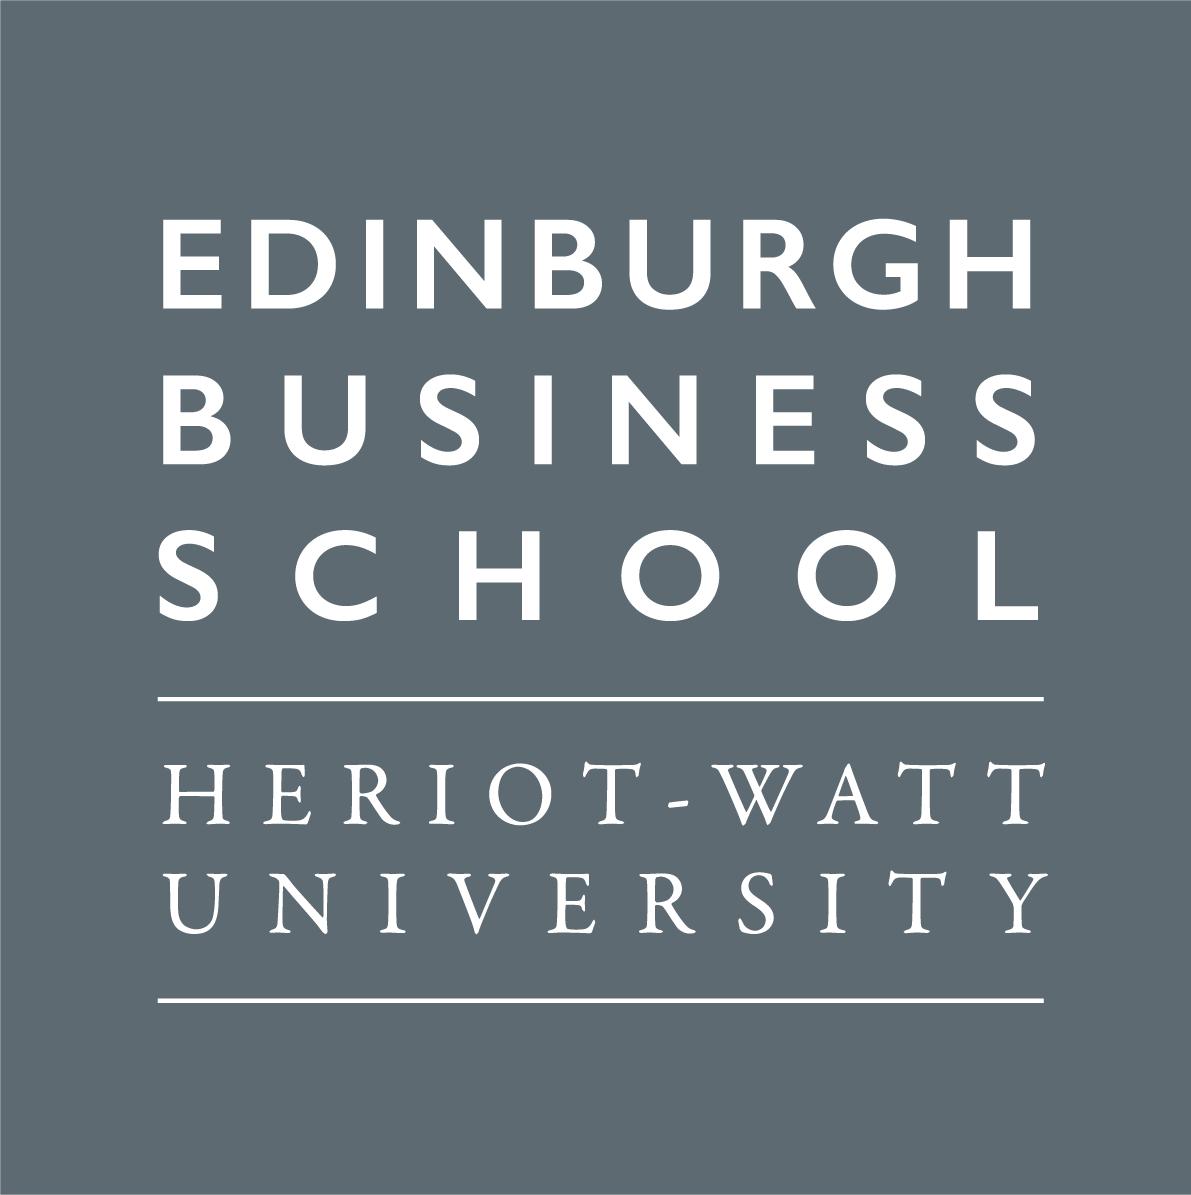 Edinburgh Business School, Heriot-Watt University